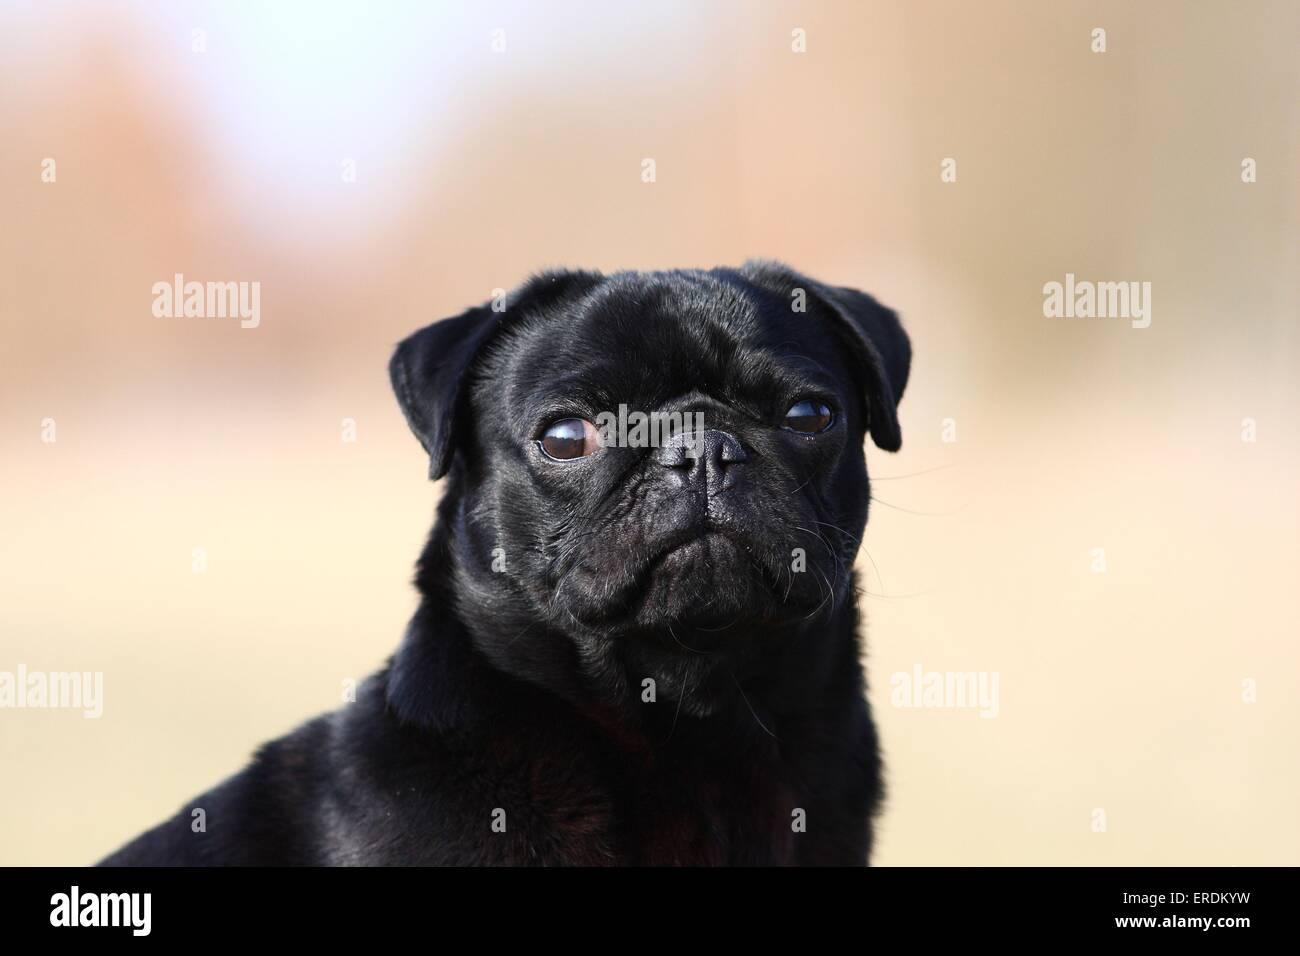 black pug - Stock Image